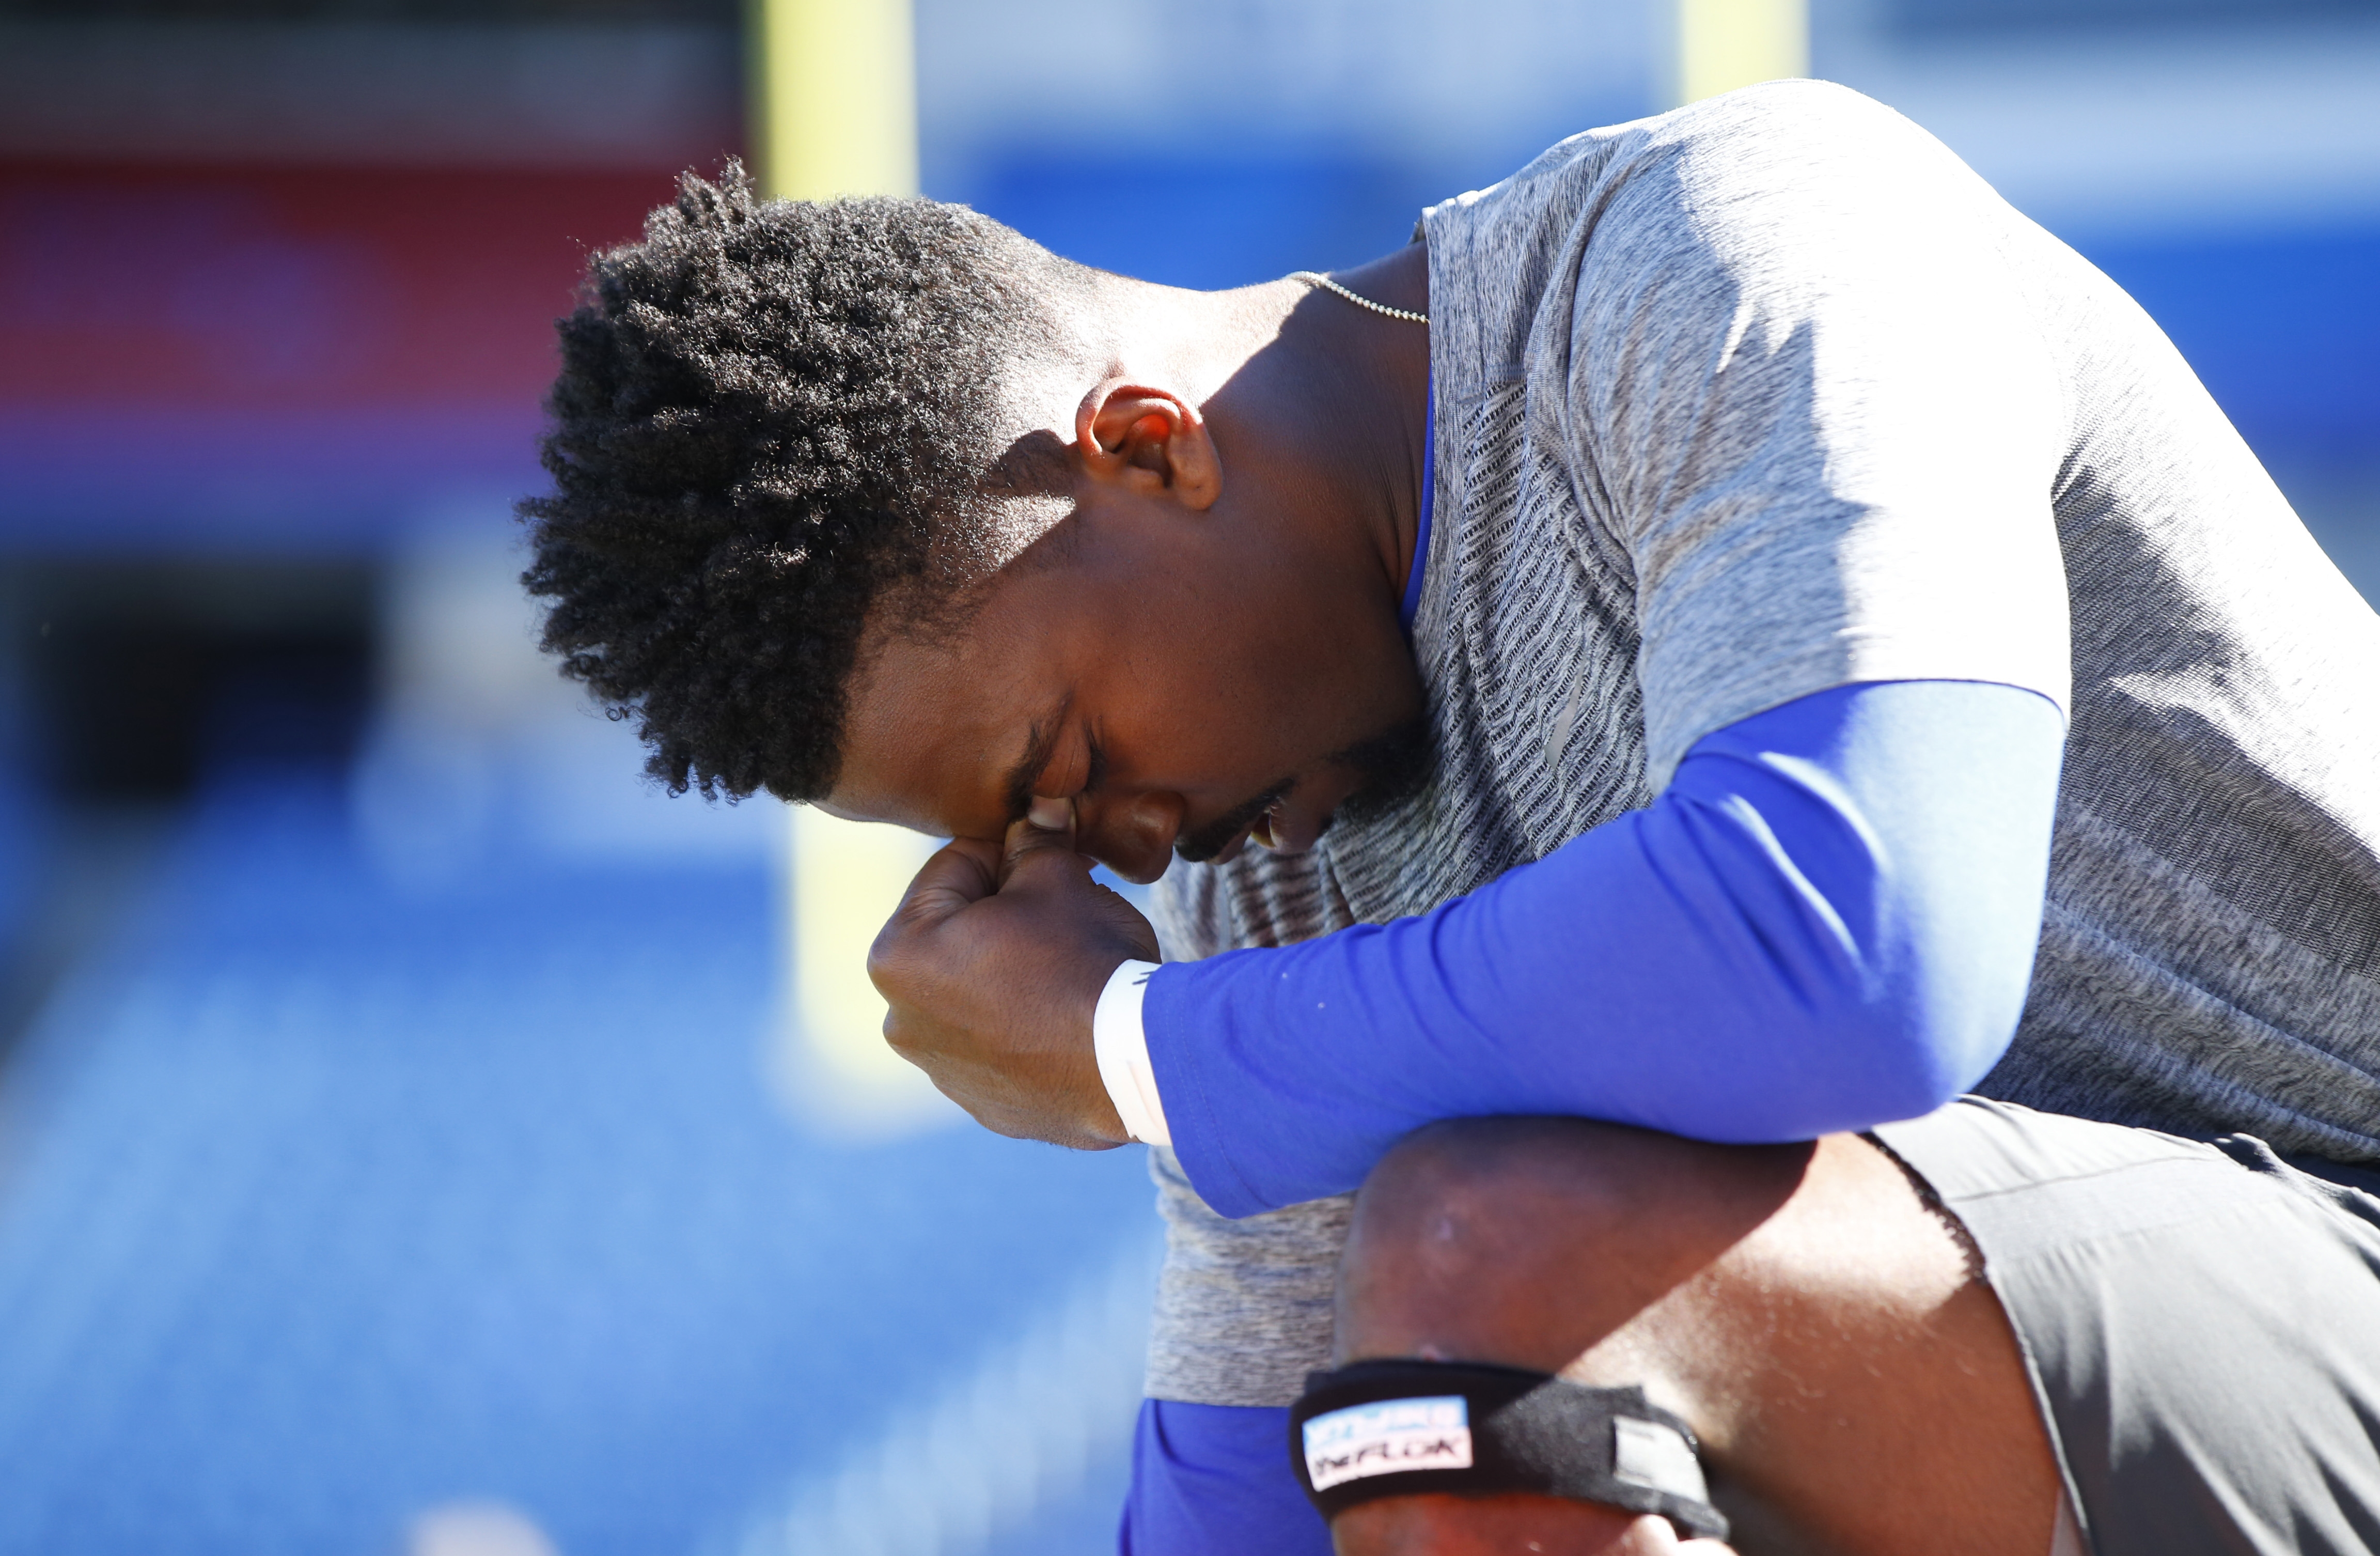 Buffalo Bills quarterback Tyrod Taylor takes a knee and prays prior to pregame against the Arizona Cardinals at New Era Field on Sunday, Sept. 25, 2016.  (Harry Scull Jr./Buffalo News)